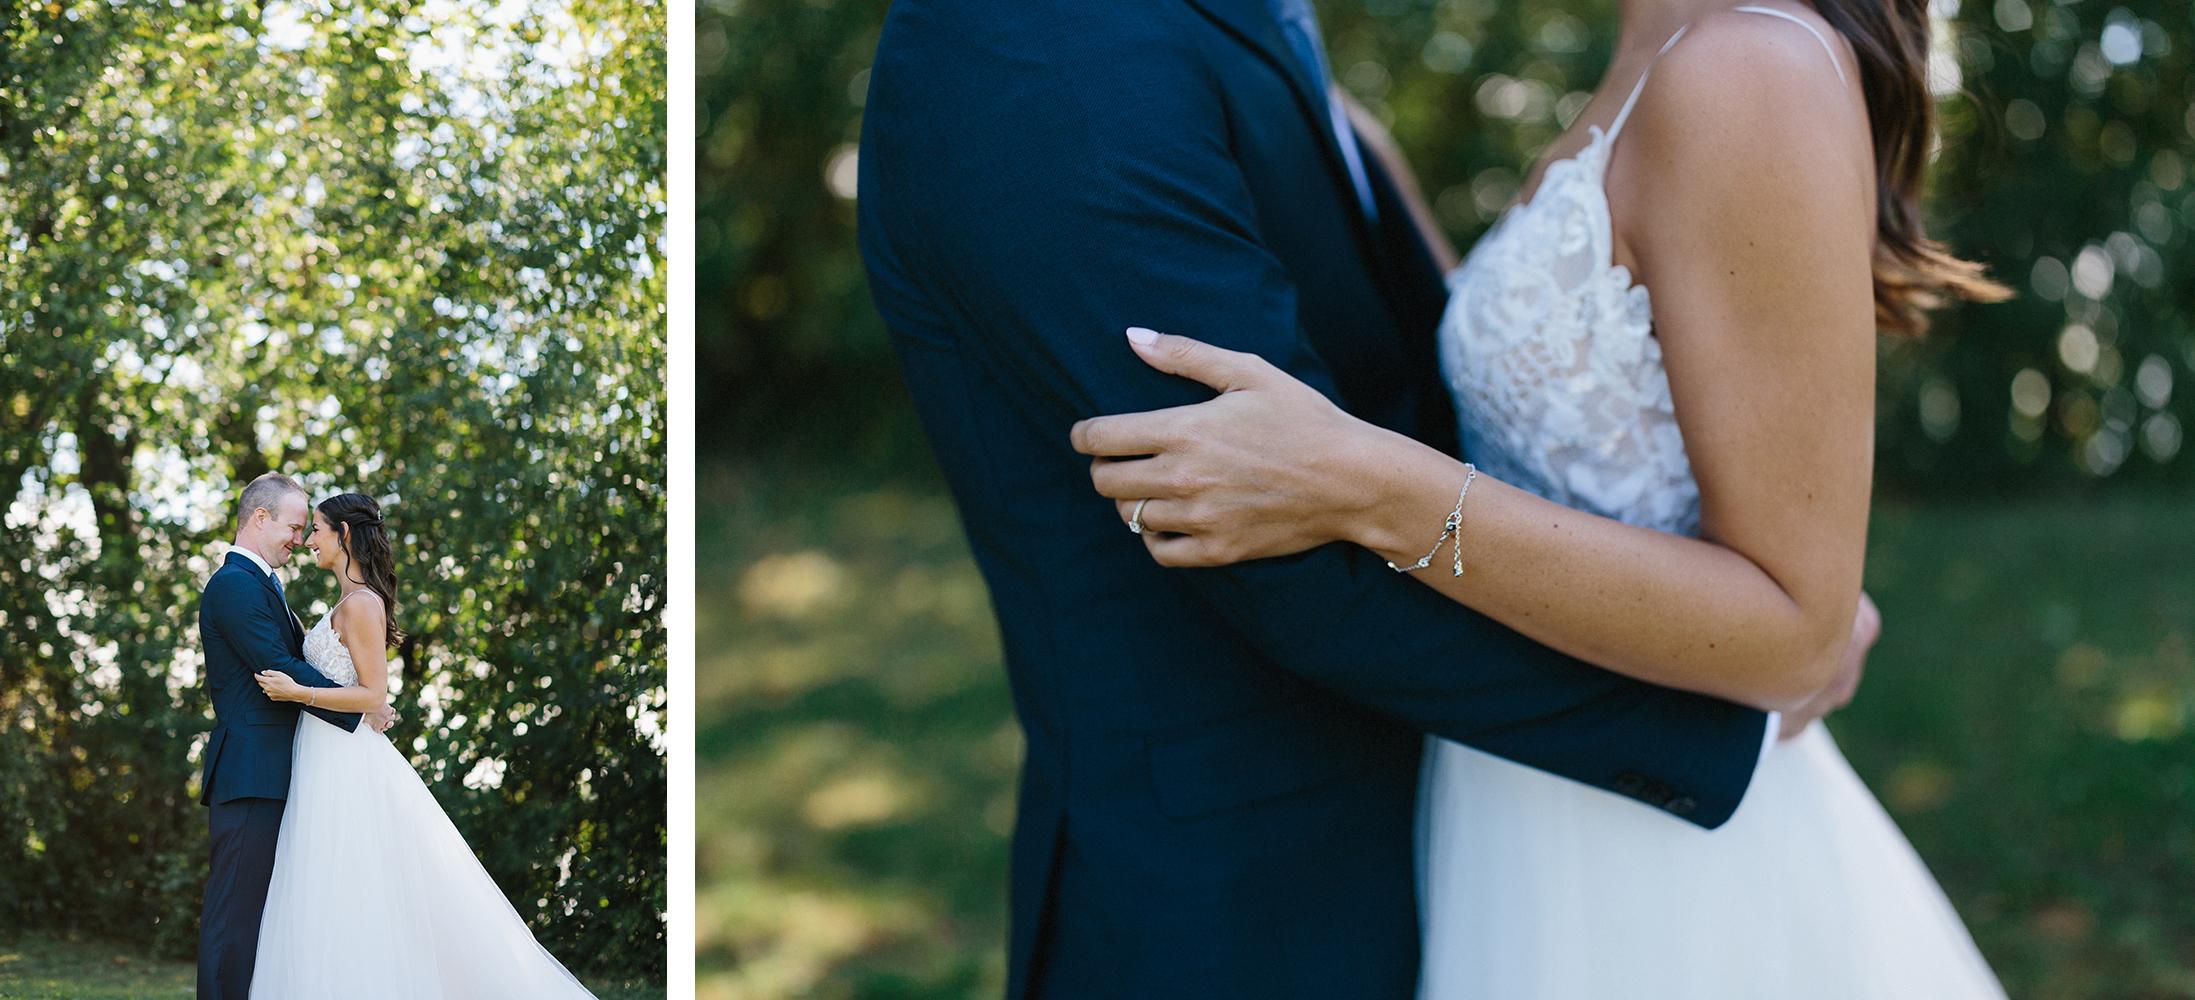 2-Couples-Portraits-At-Egaridge-Resort-Venue-Muskoka-Ontario-Wedding-Photography-by-Ryanne-Hollies-Photography-Toronto-Documentary-Wedding-Photographer.jpg